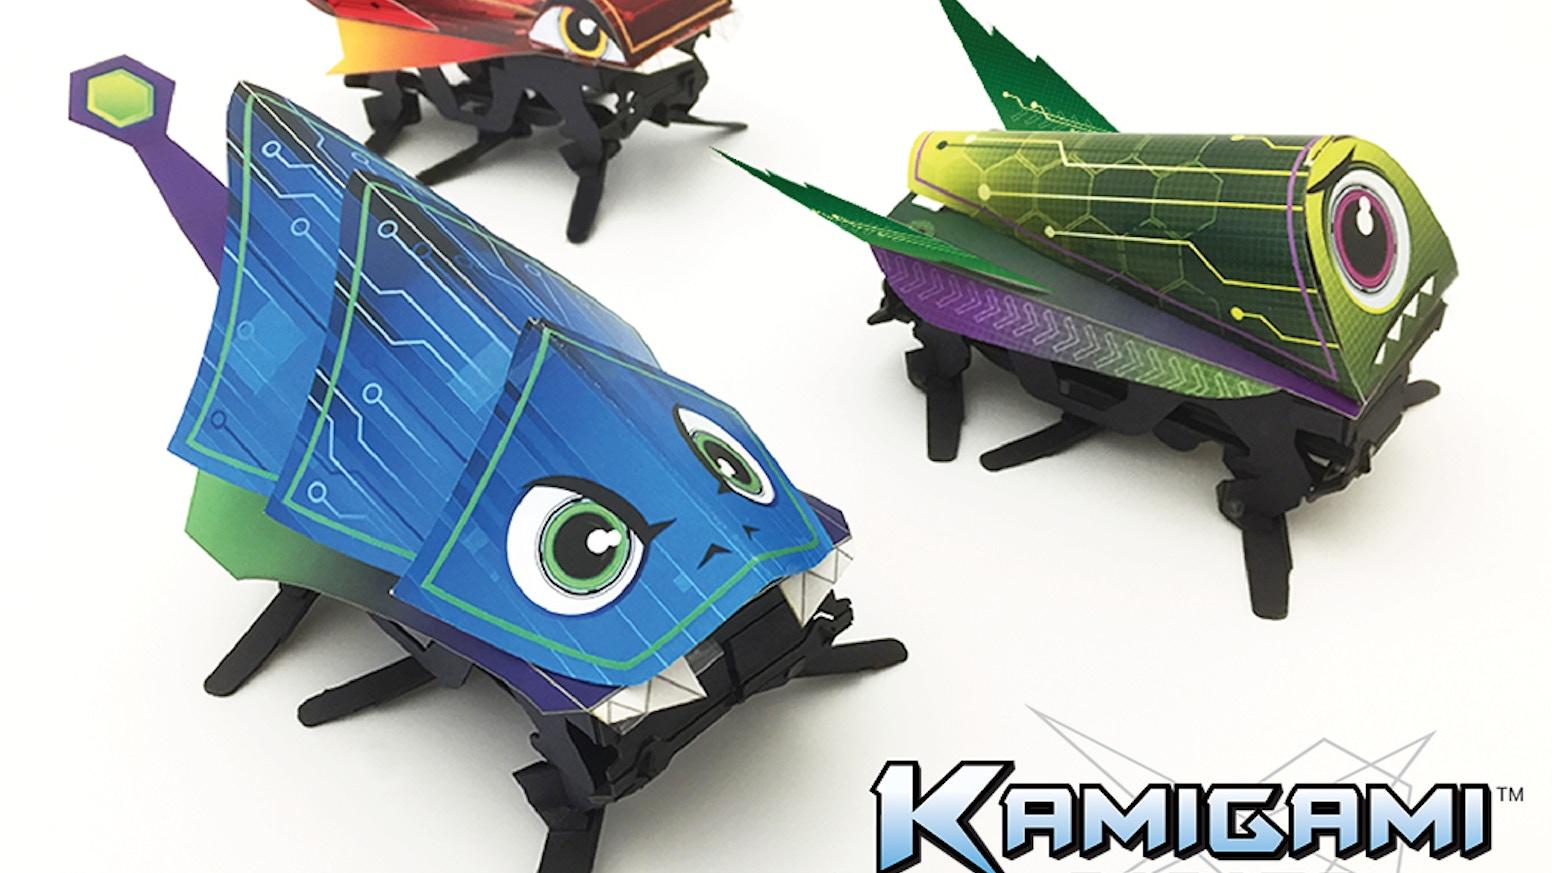 Lightning-fast robots you can build, program and evolve.